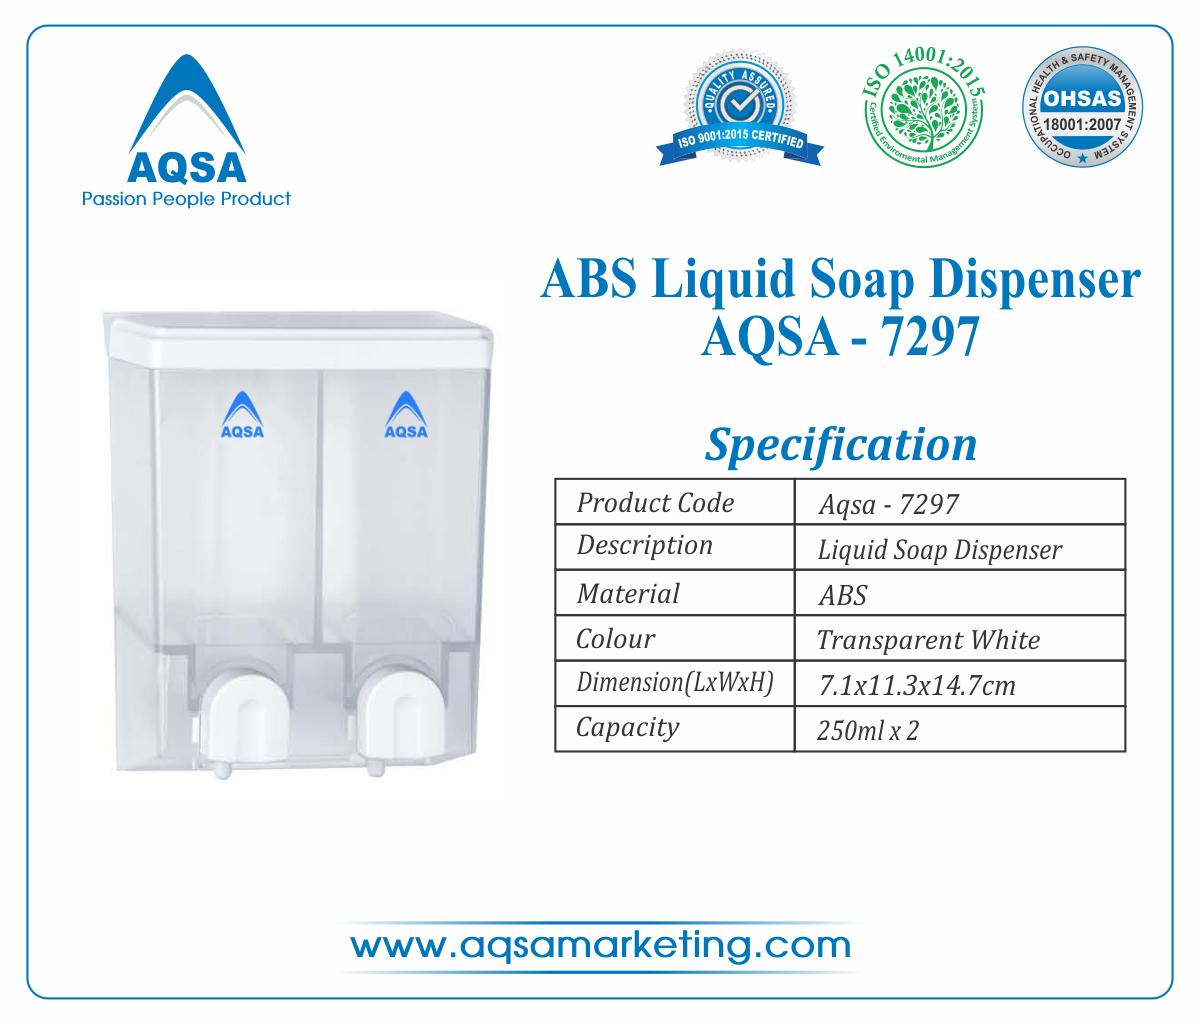 ABS Soap Dispenser 250ml x 2 AQSA-7297 image